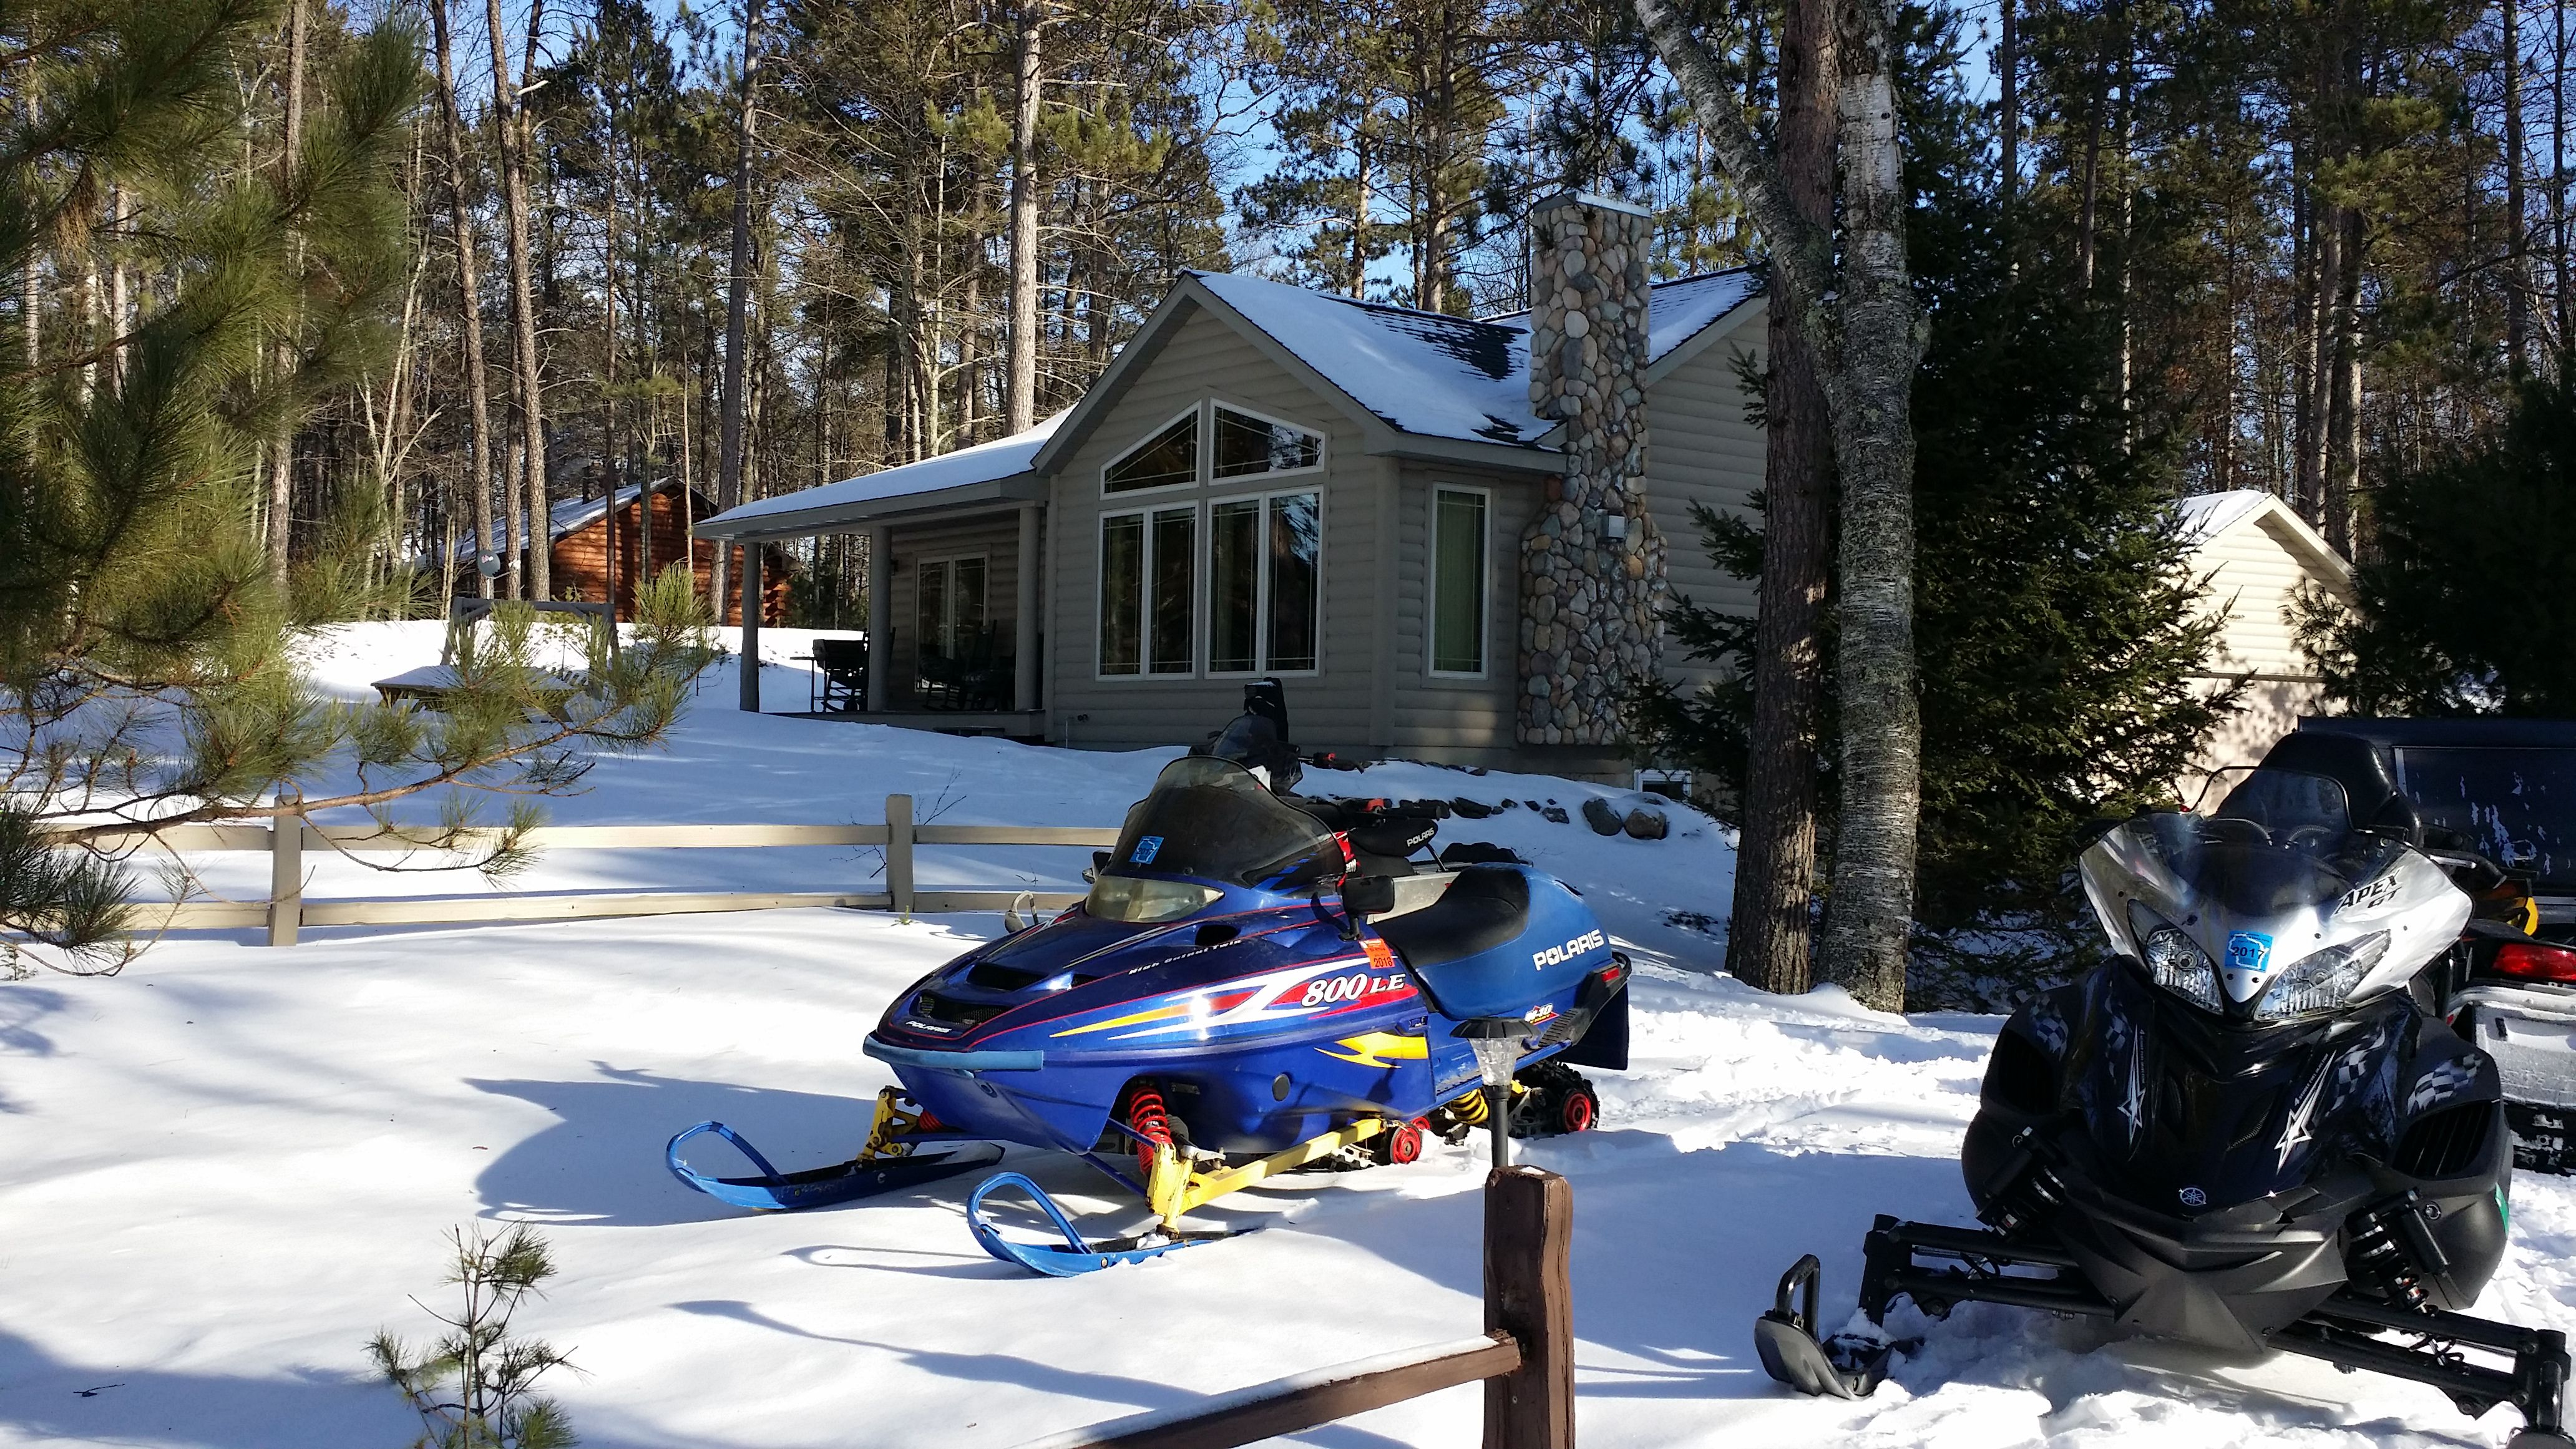 Winter friendly! Plenty of parking for sleds, trucks & trailers